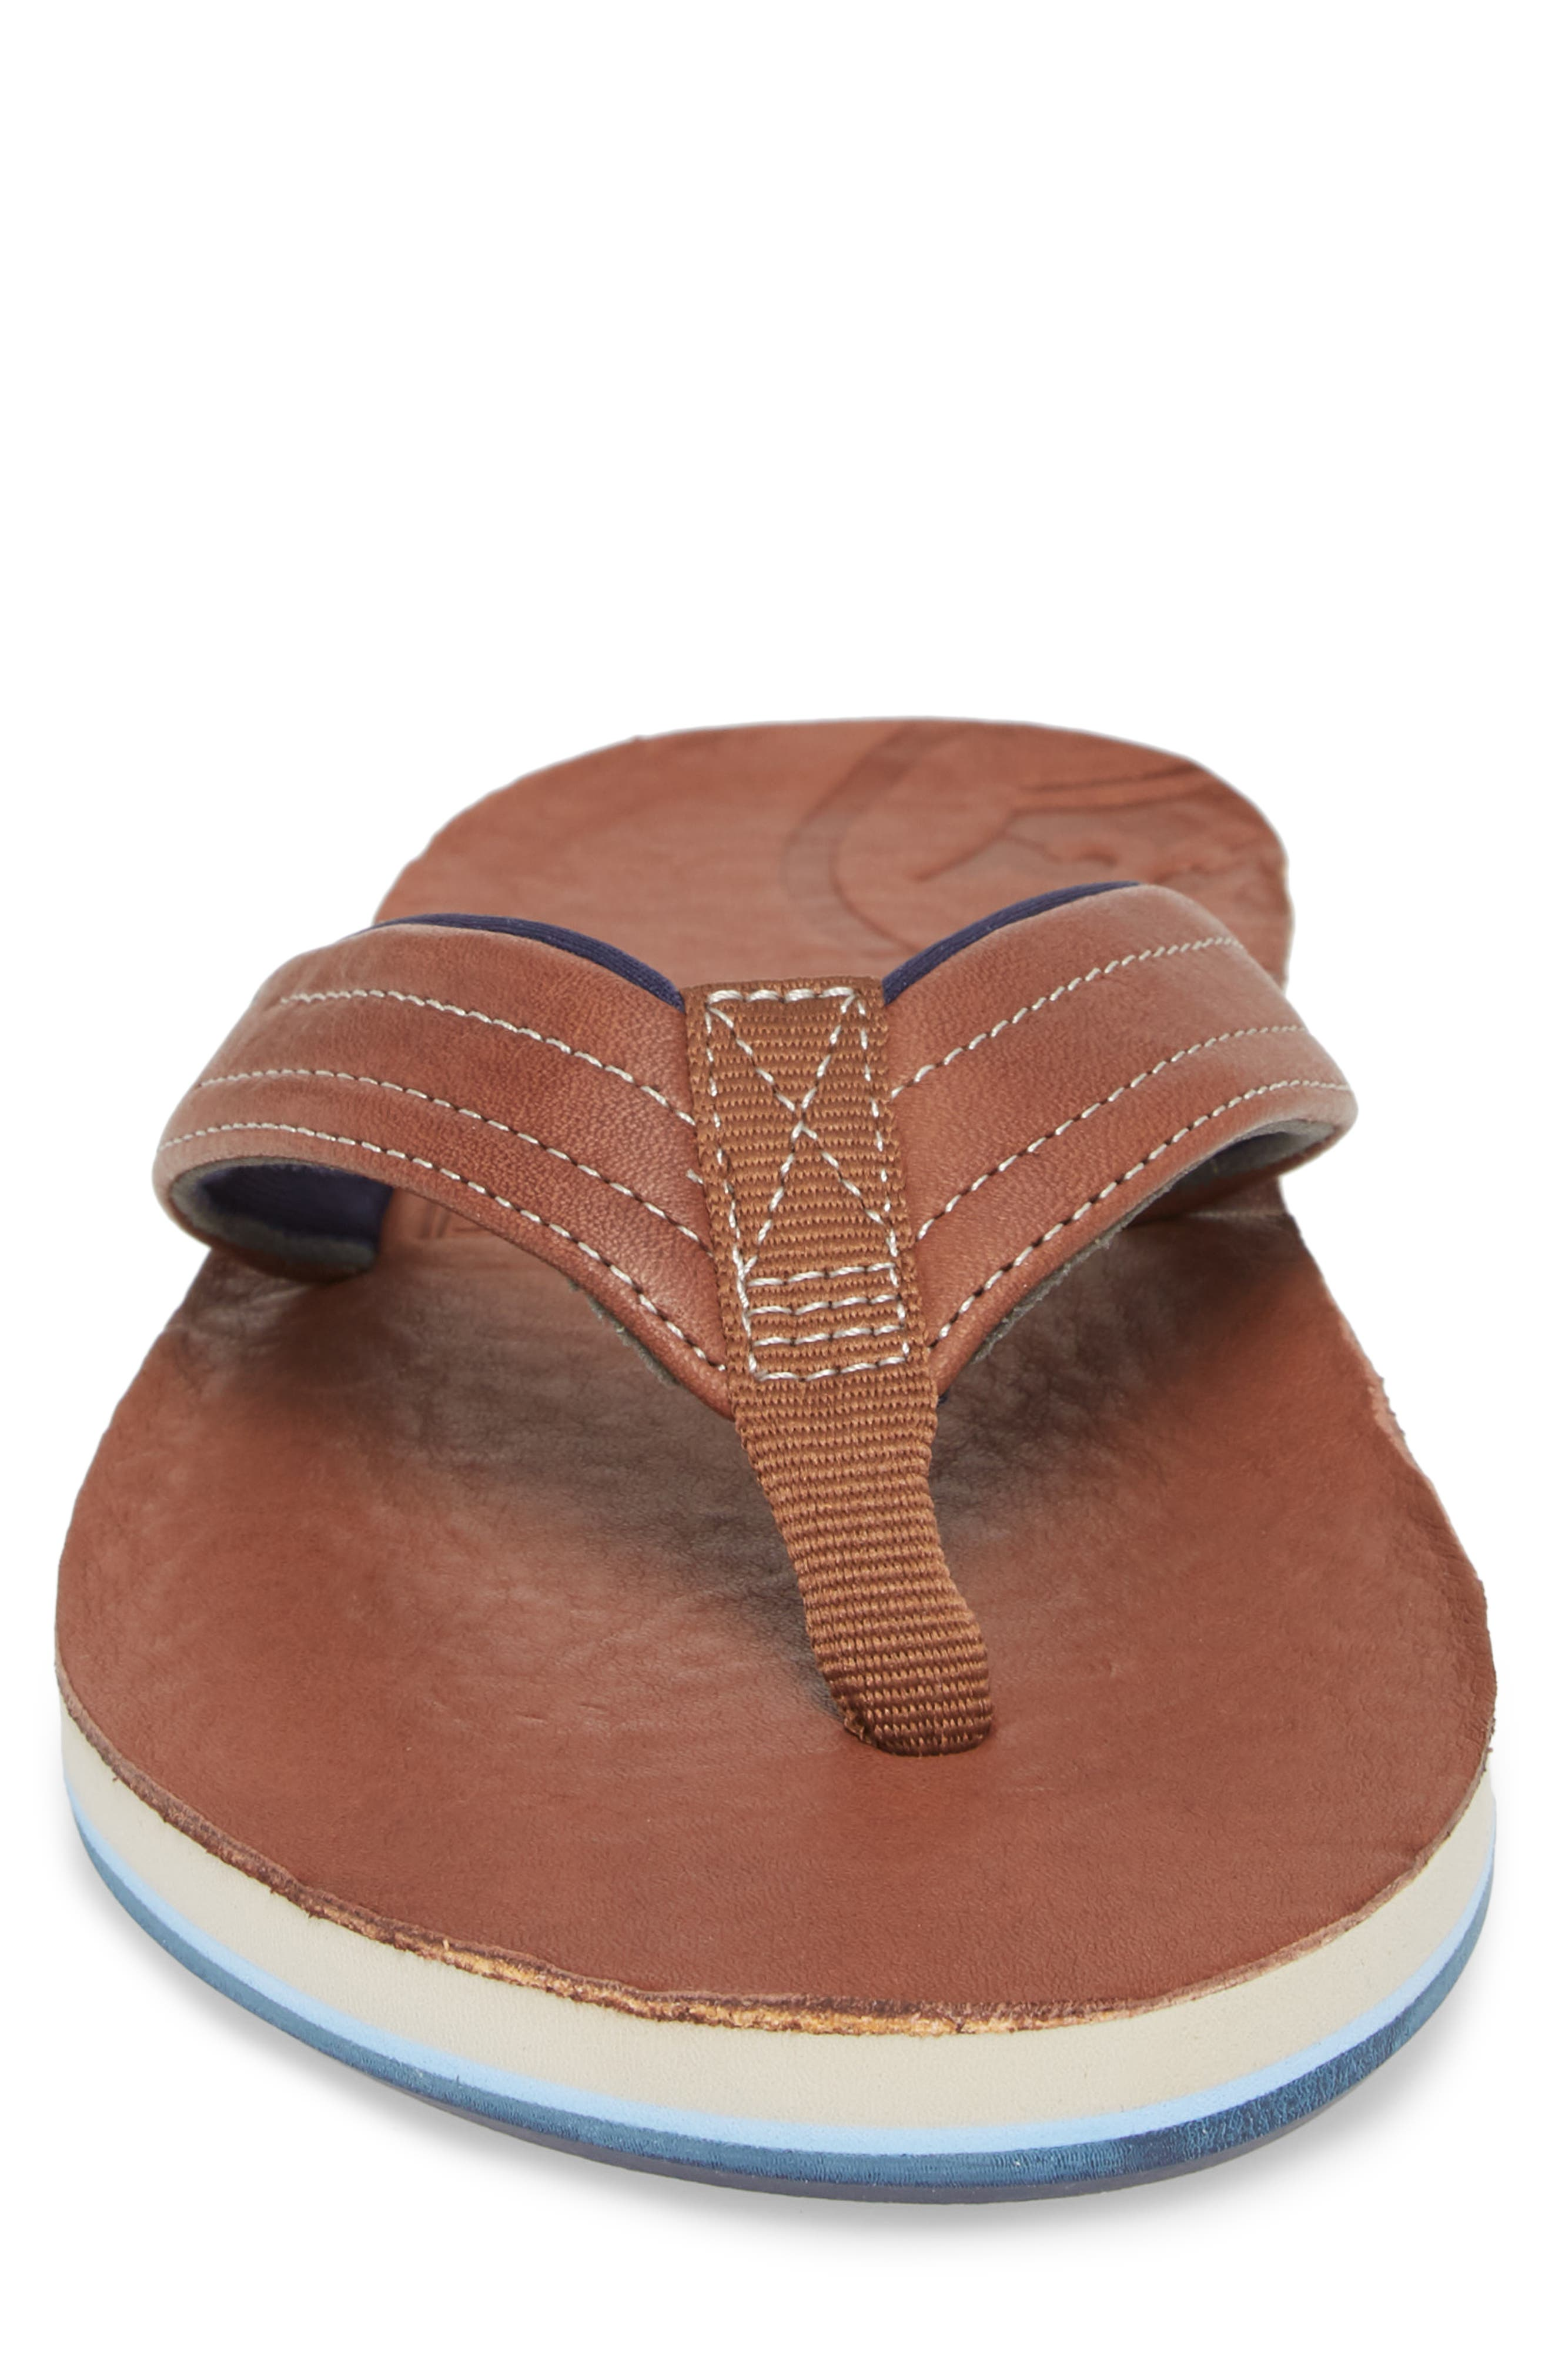 x Peter Millar Leather Flip Flop,                             Alternate thumbnail 4, color,                             Dark Chocolate Leather